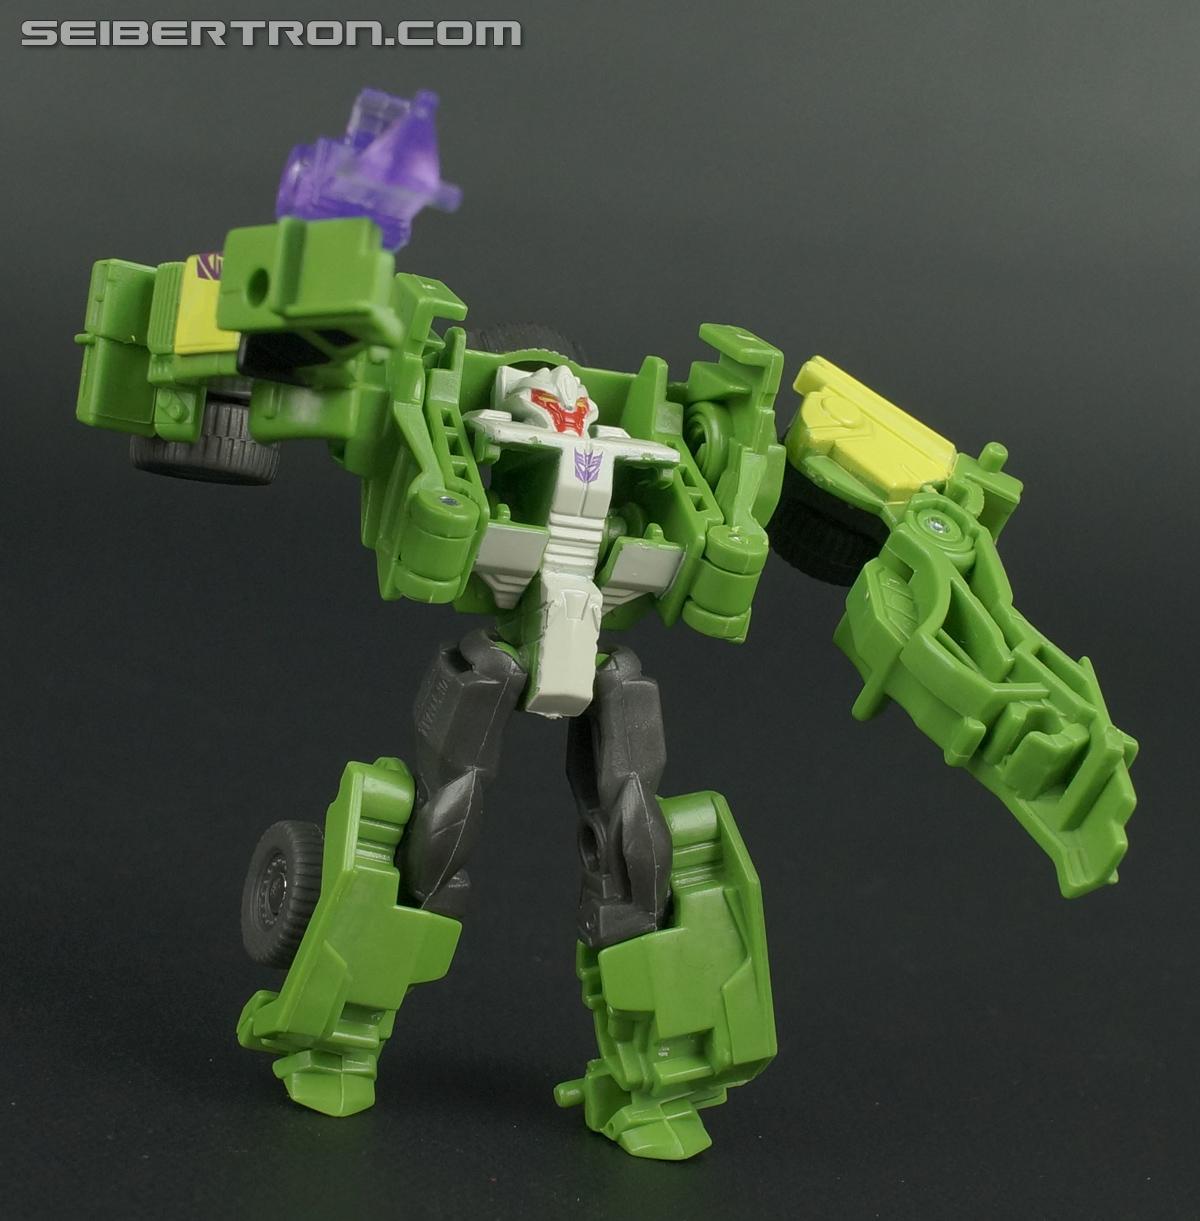 Transformers Prime Beast Hunters Cyberverse Breakdown (Apex Hunter Armor) (Image #68 of 96)